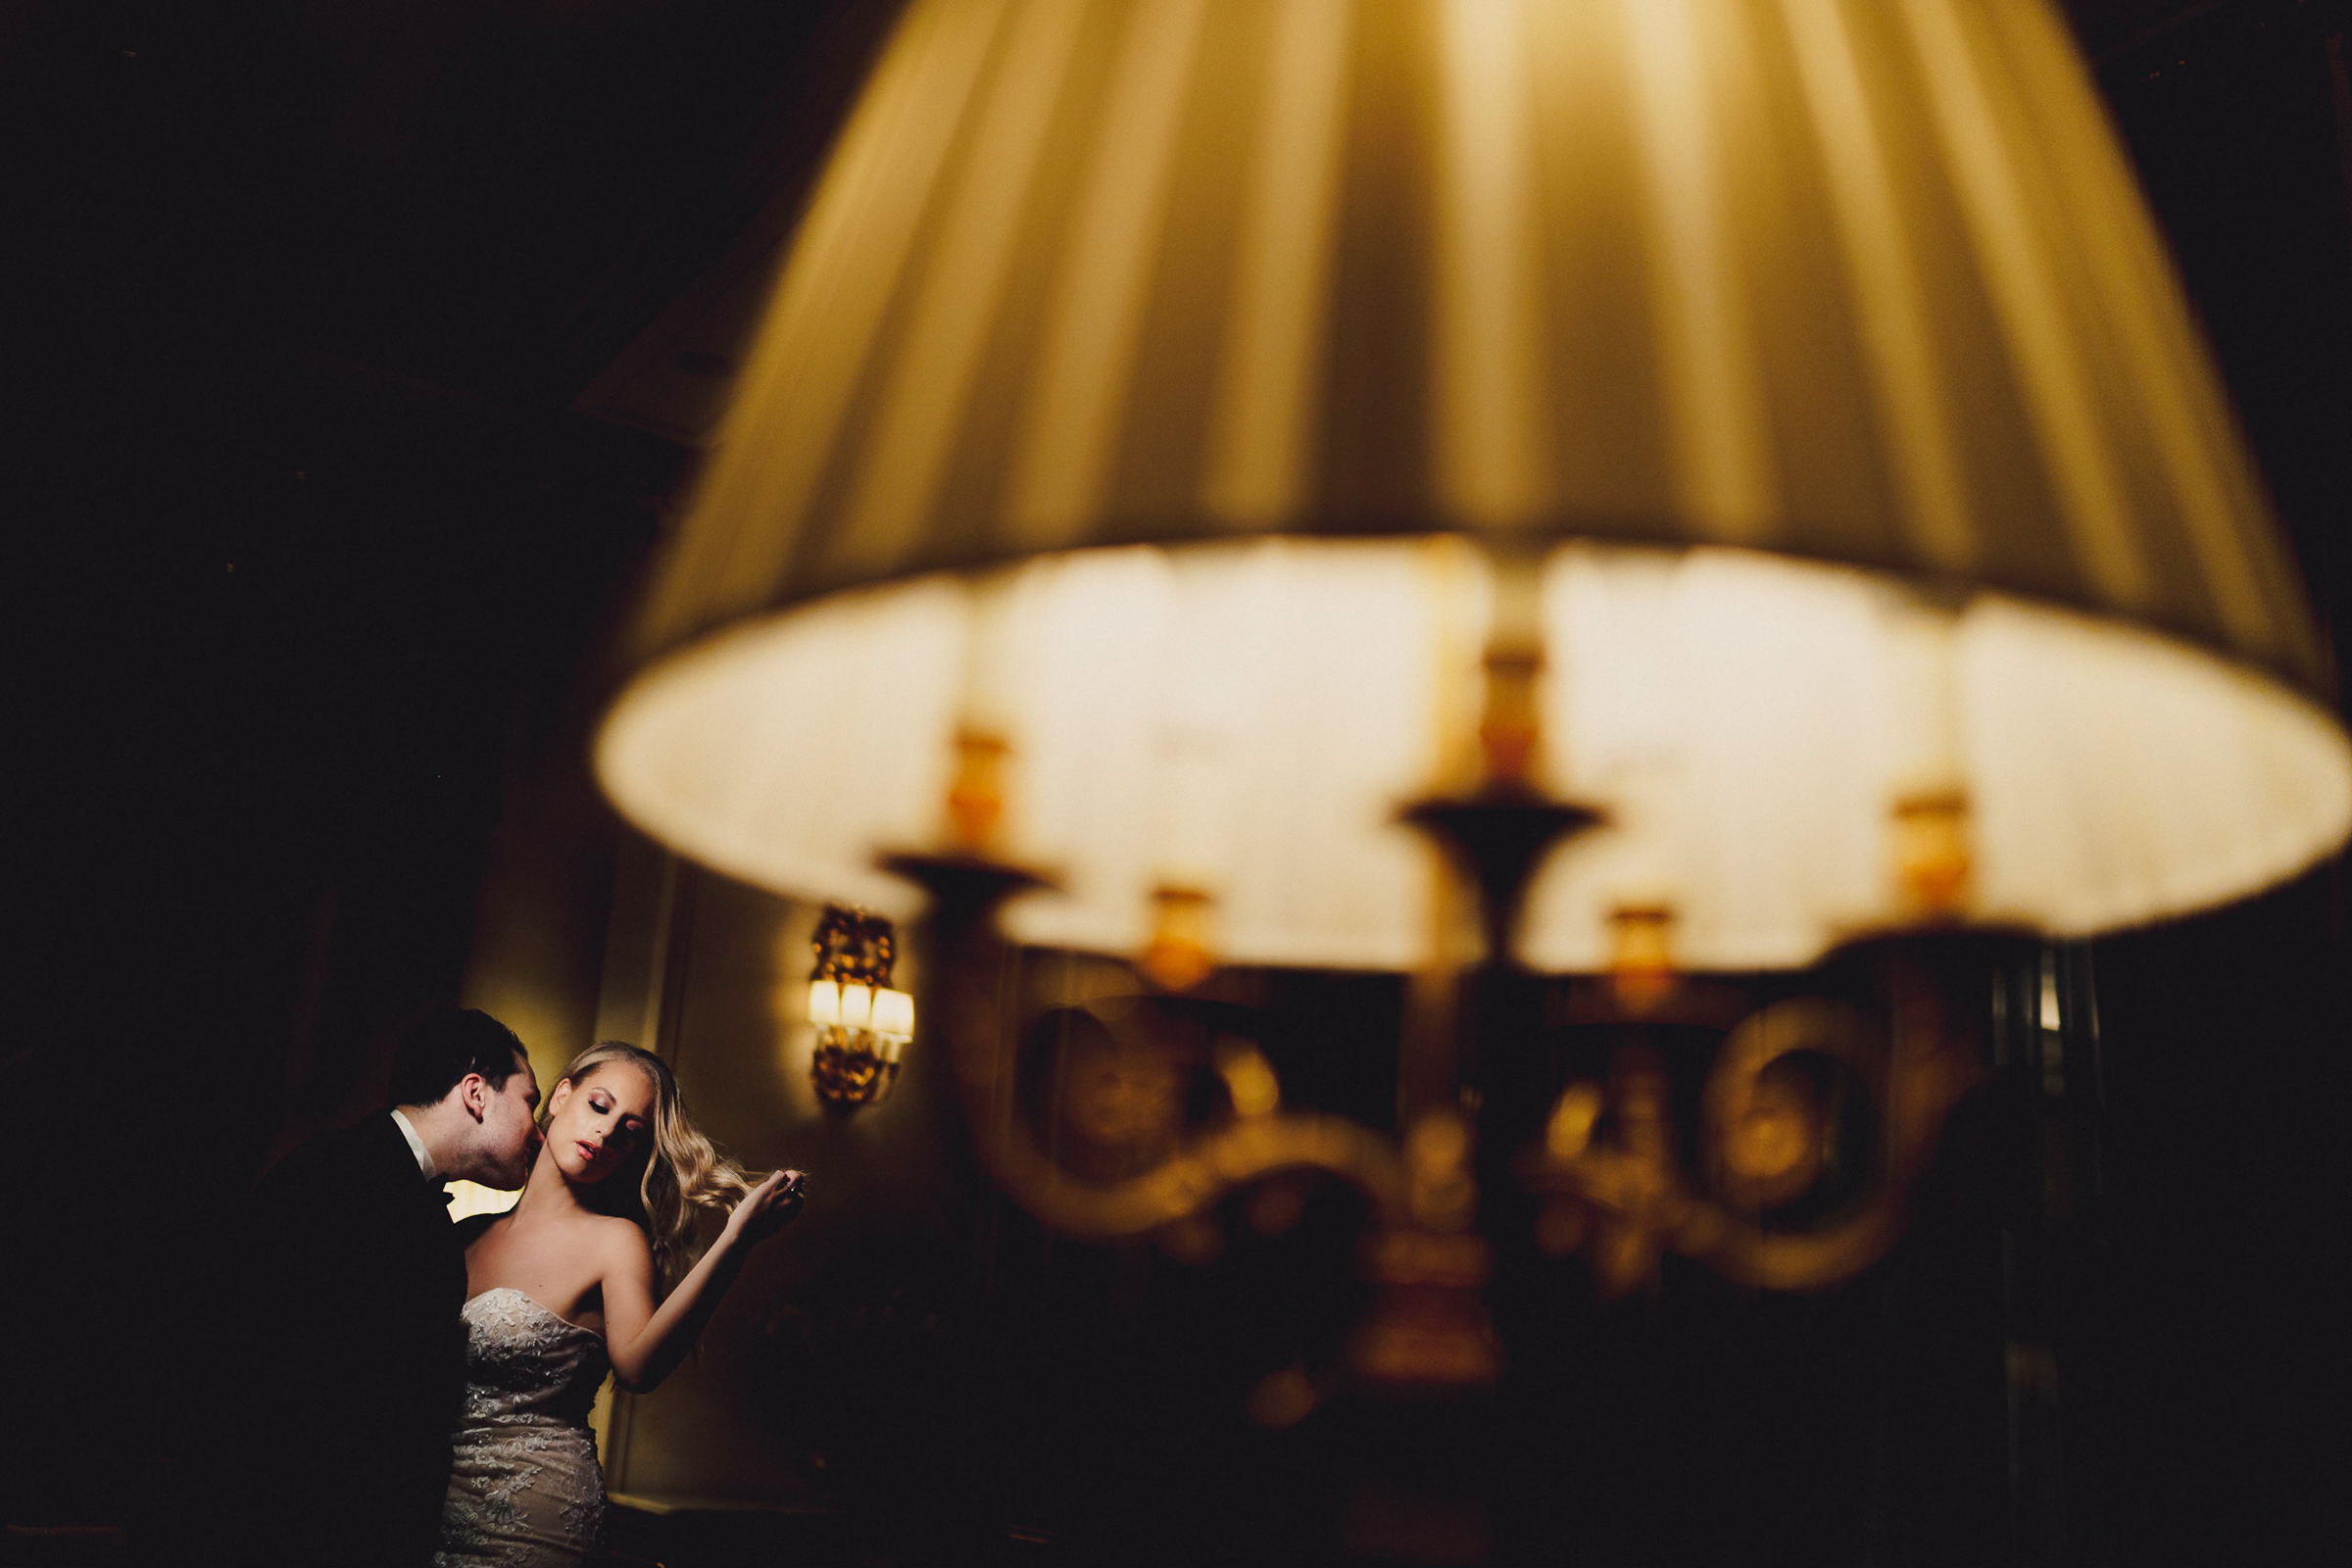 Groom kisses bride's neck - photo by MIKI STUDIOS